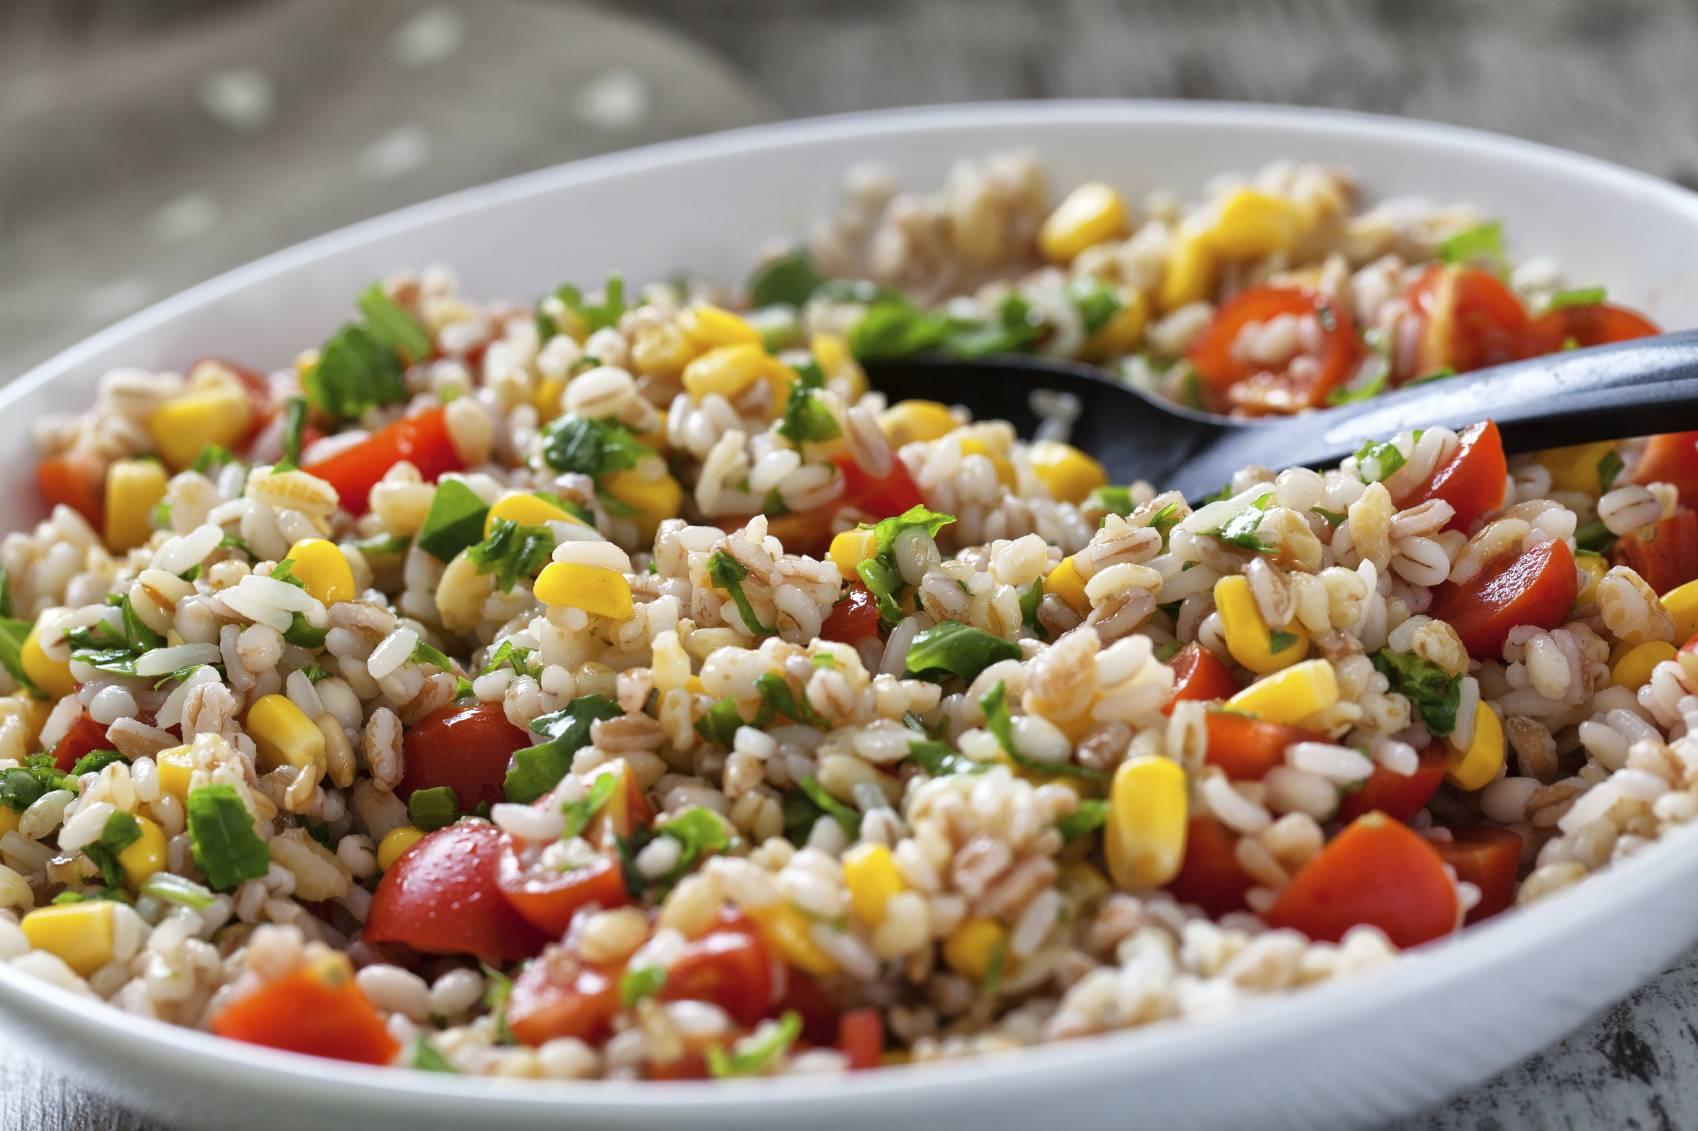 Ricette Orzo Vegetariano.Insalata Di Farro Vegetariana 5 Ricette Food Blog